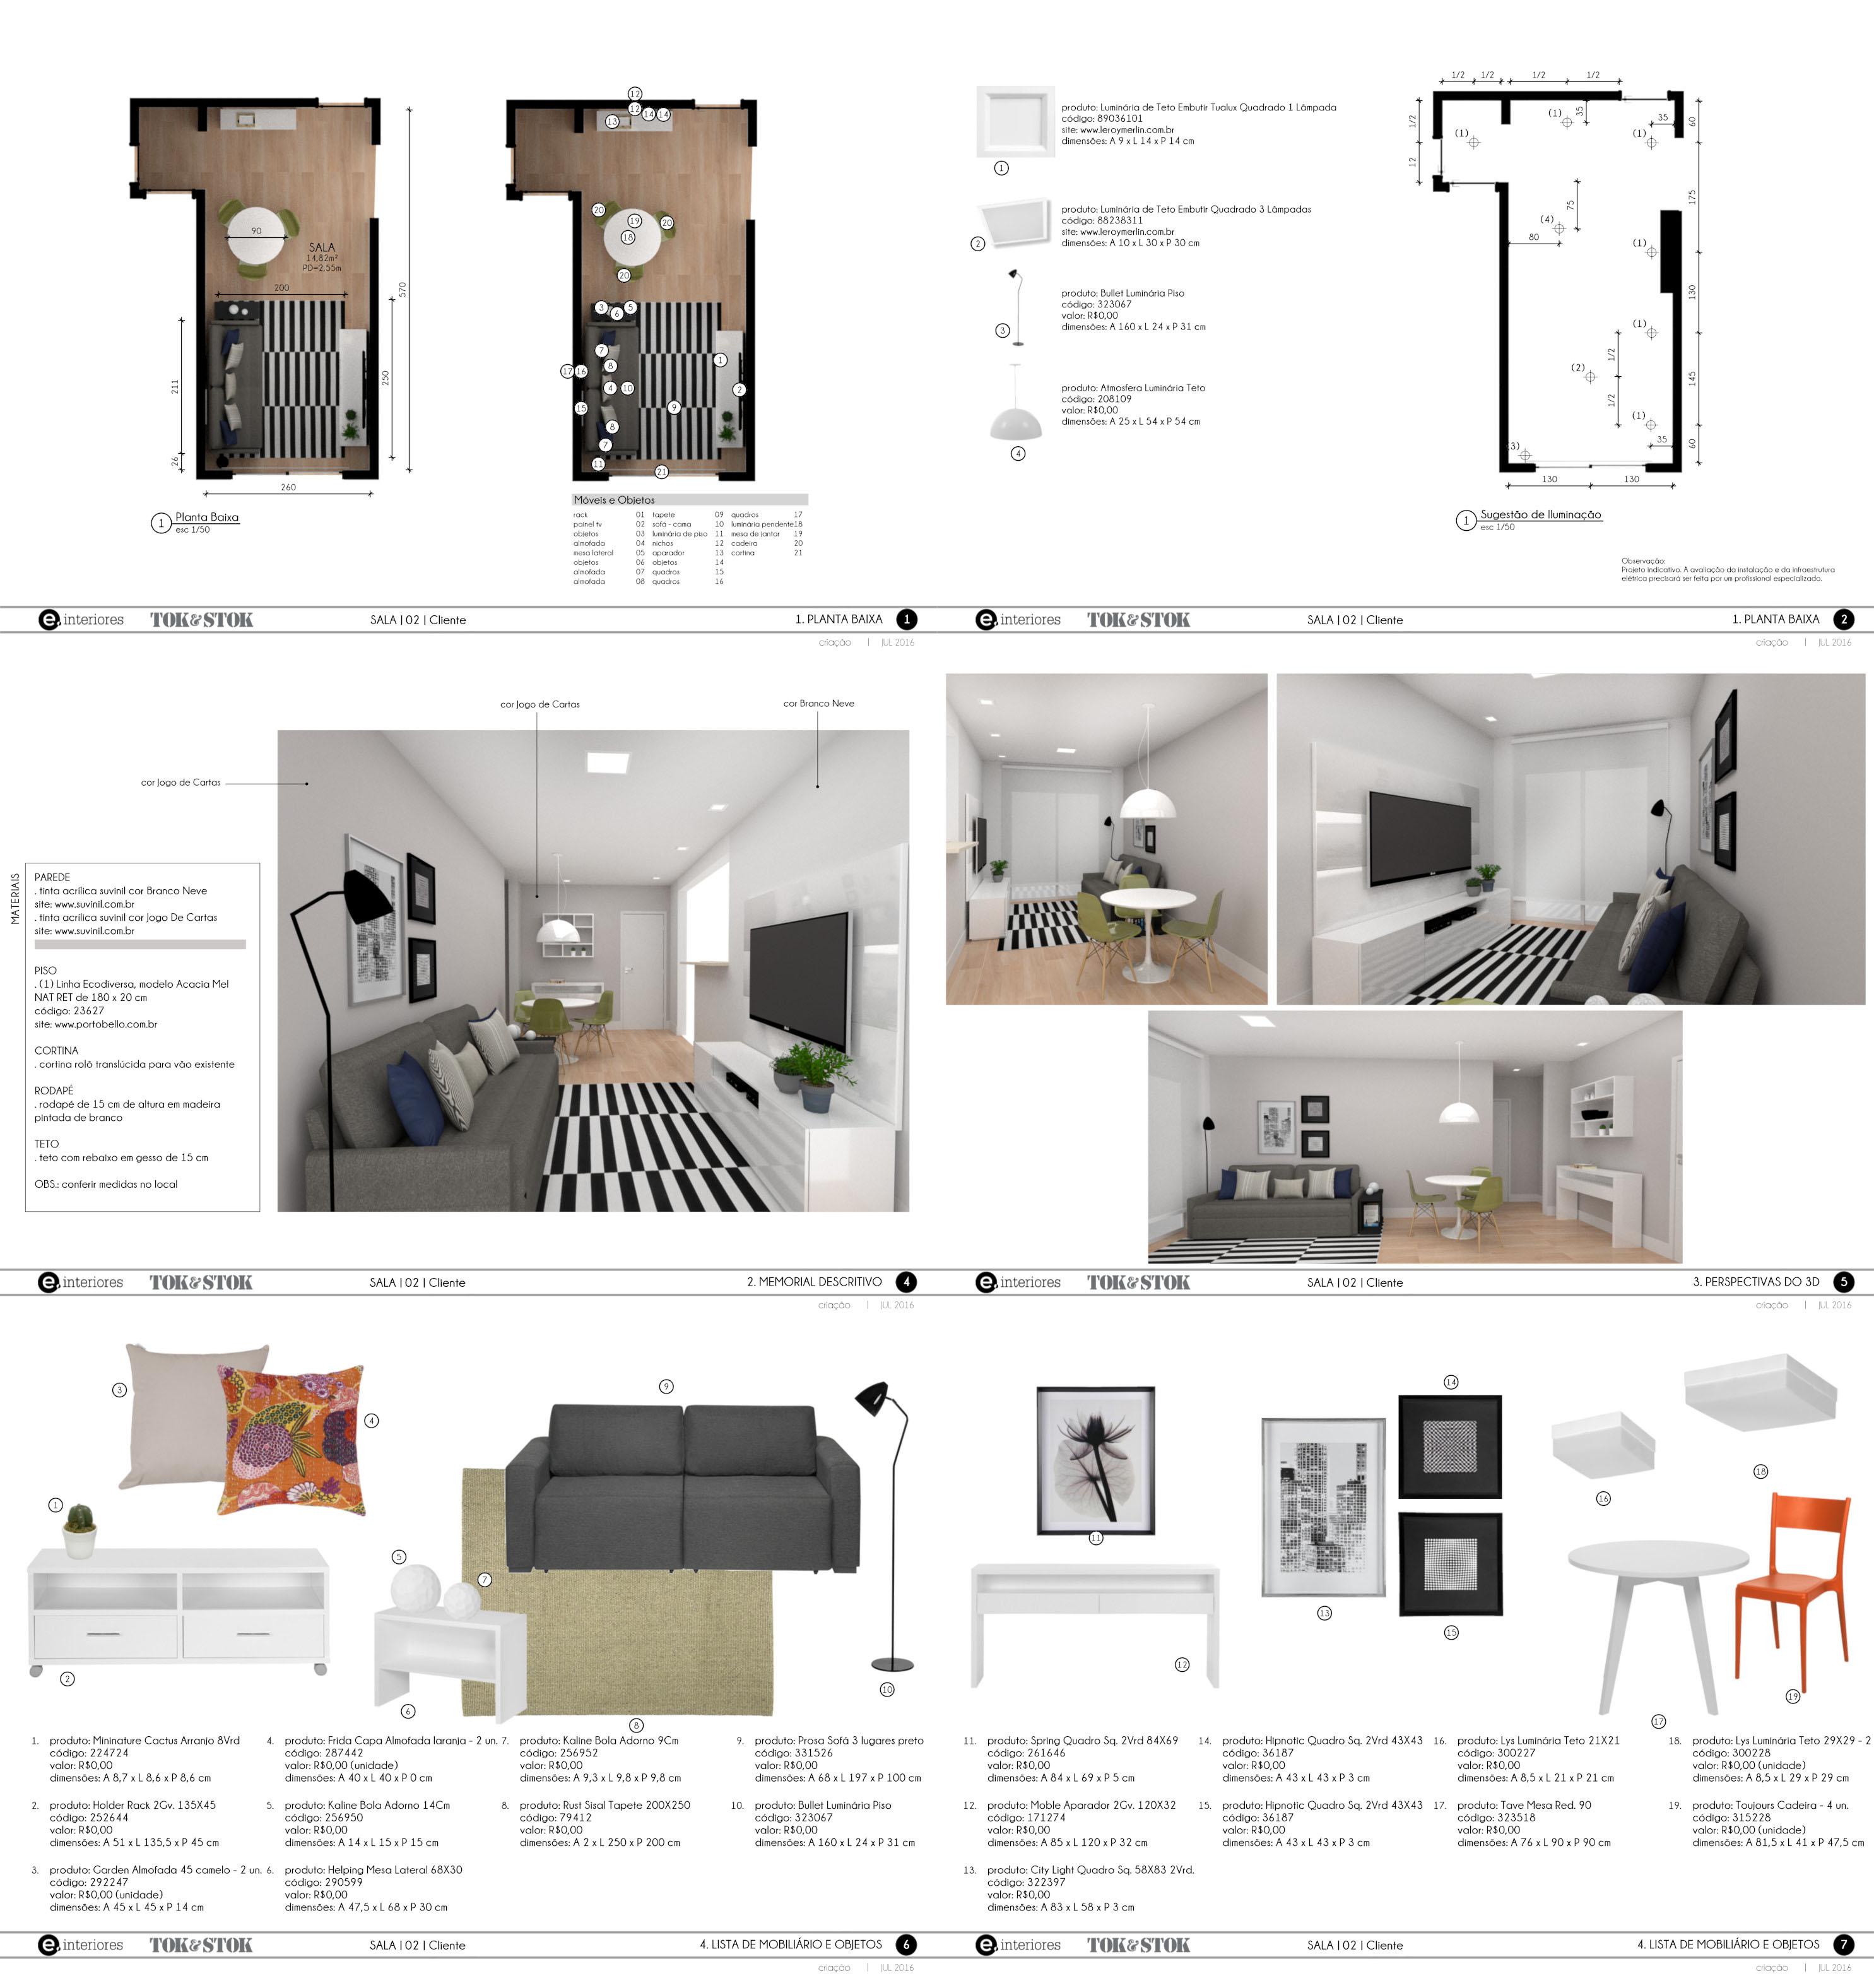 E interiores next generation interior design with blender for Interior design board software